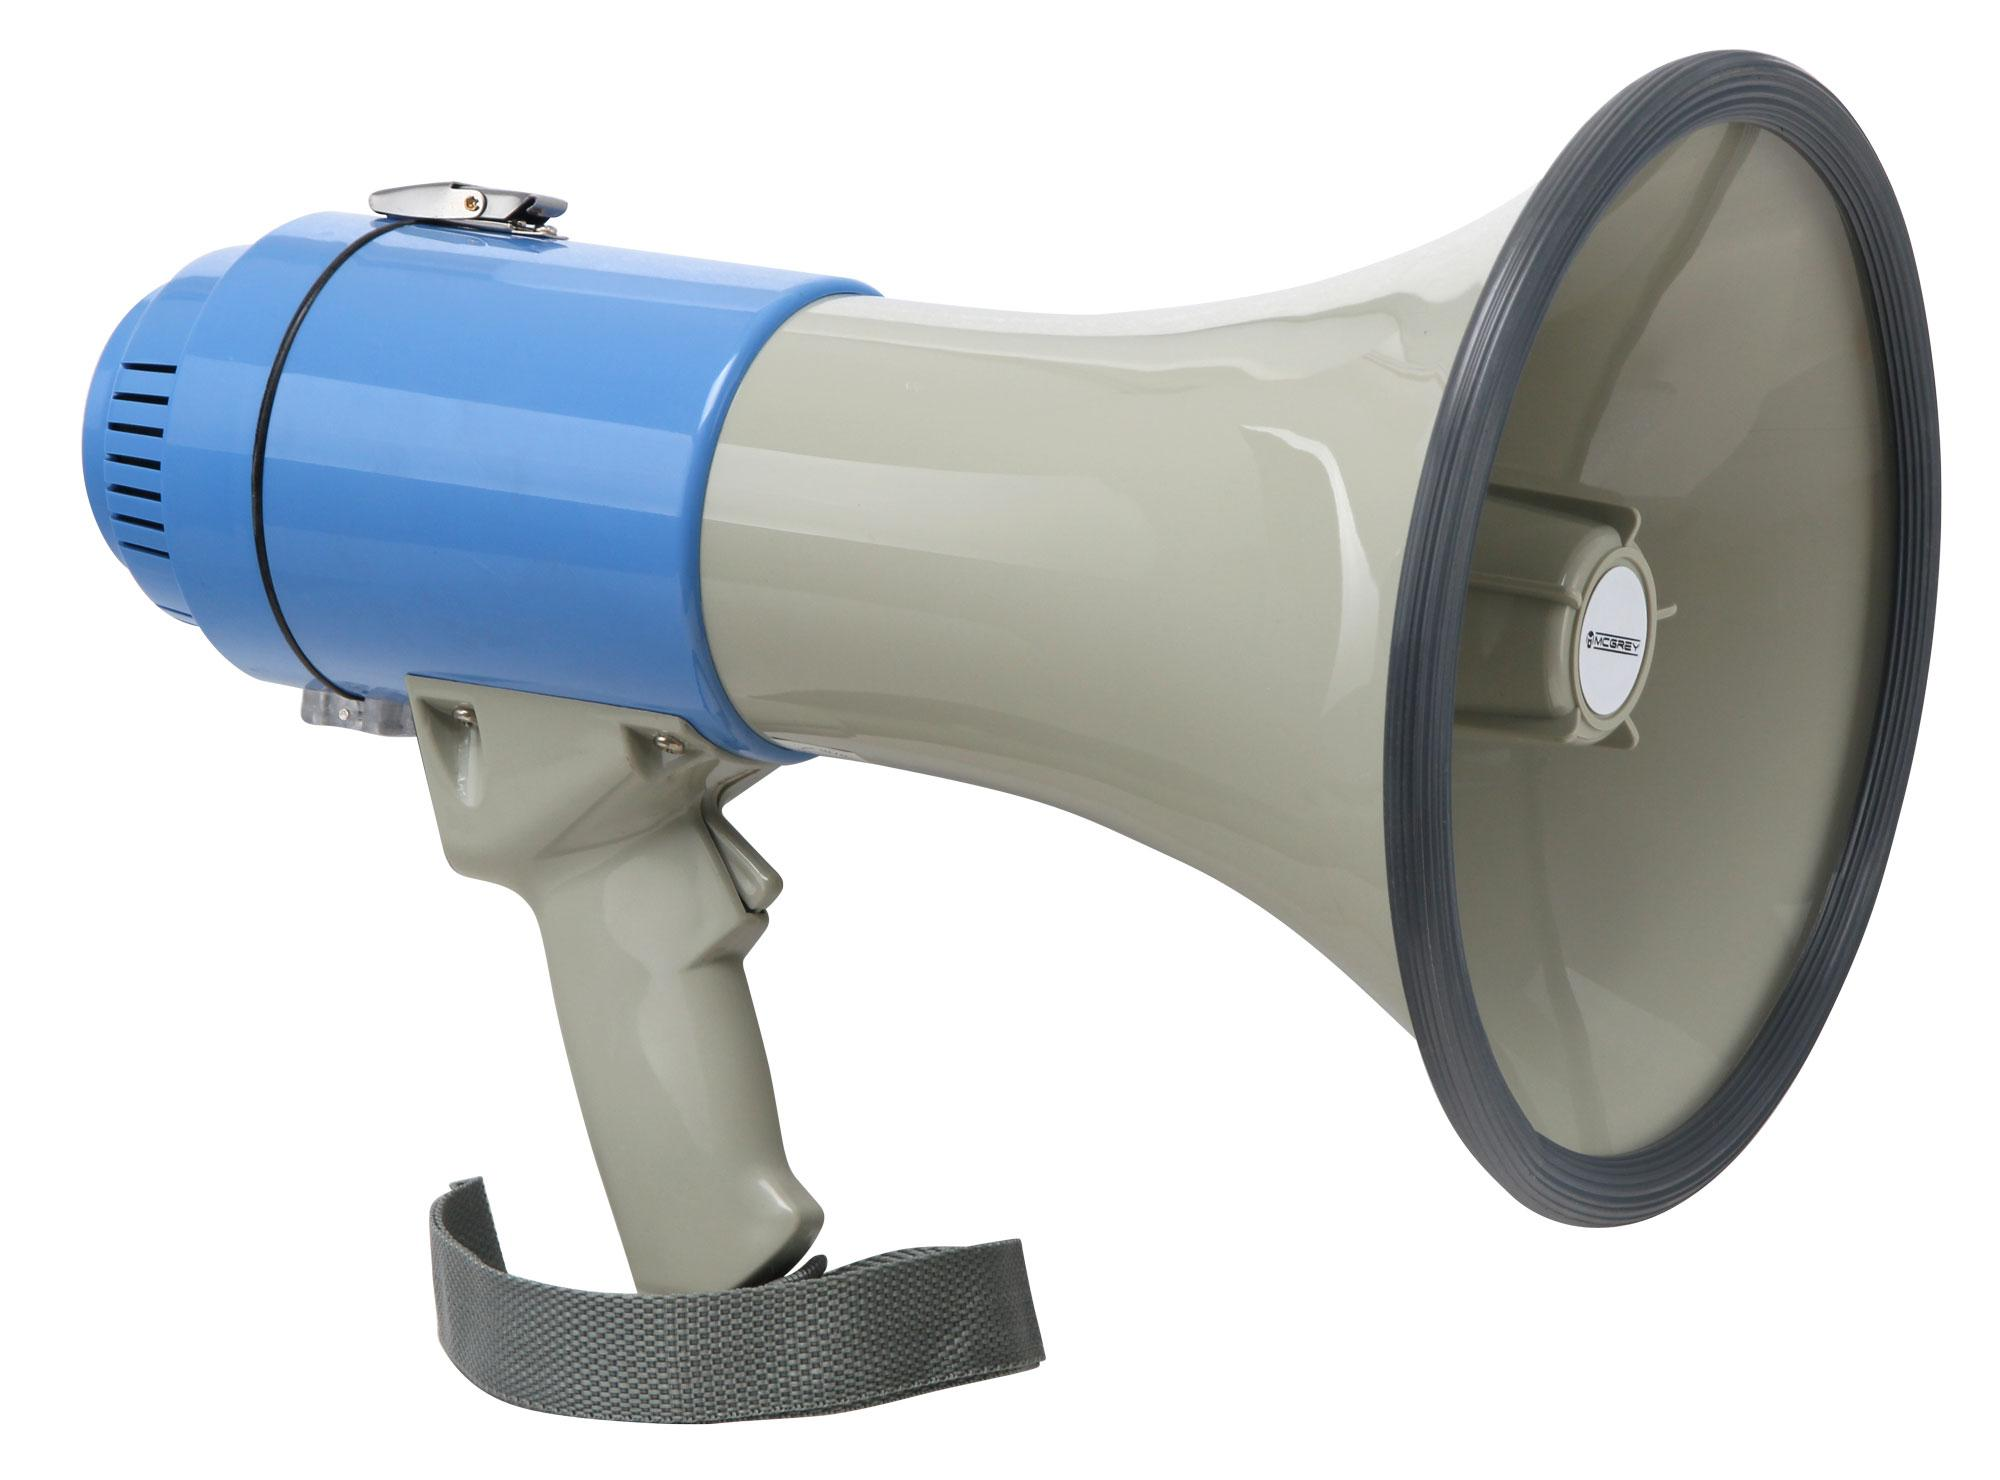 Mikrofone - McGrey MP 200S Megaphon, max. 60 Watt, 1000m - Onlineshop Musikhaus Kirstein